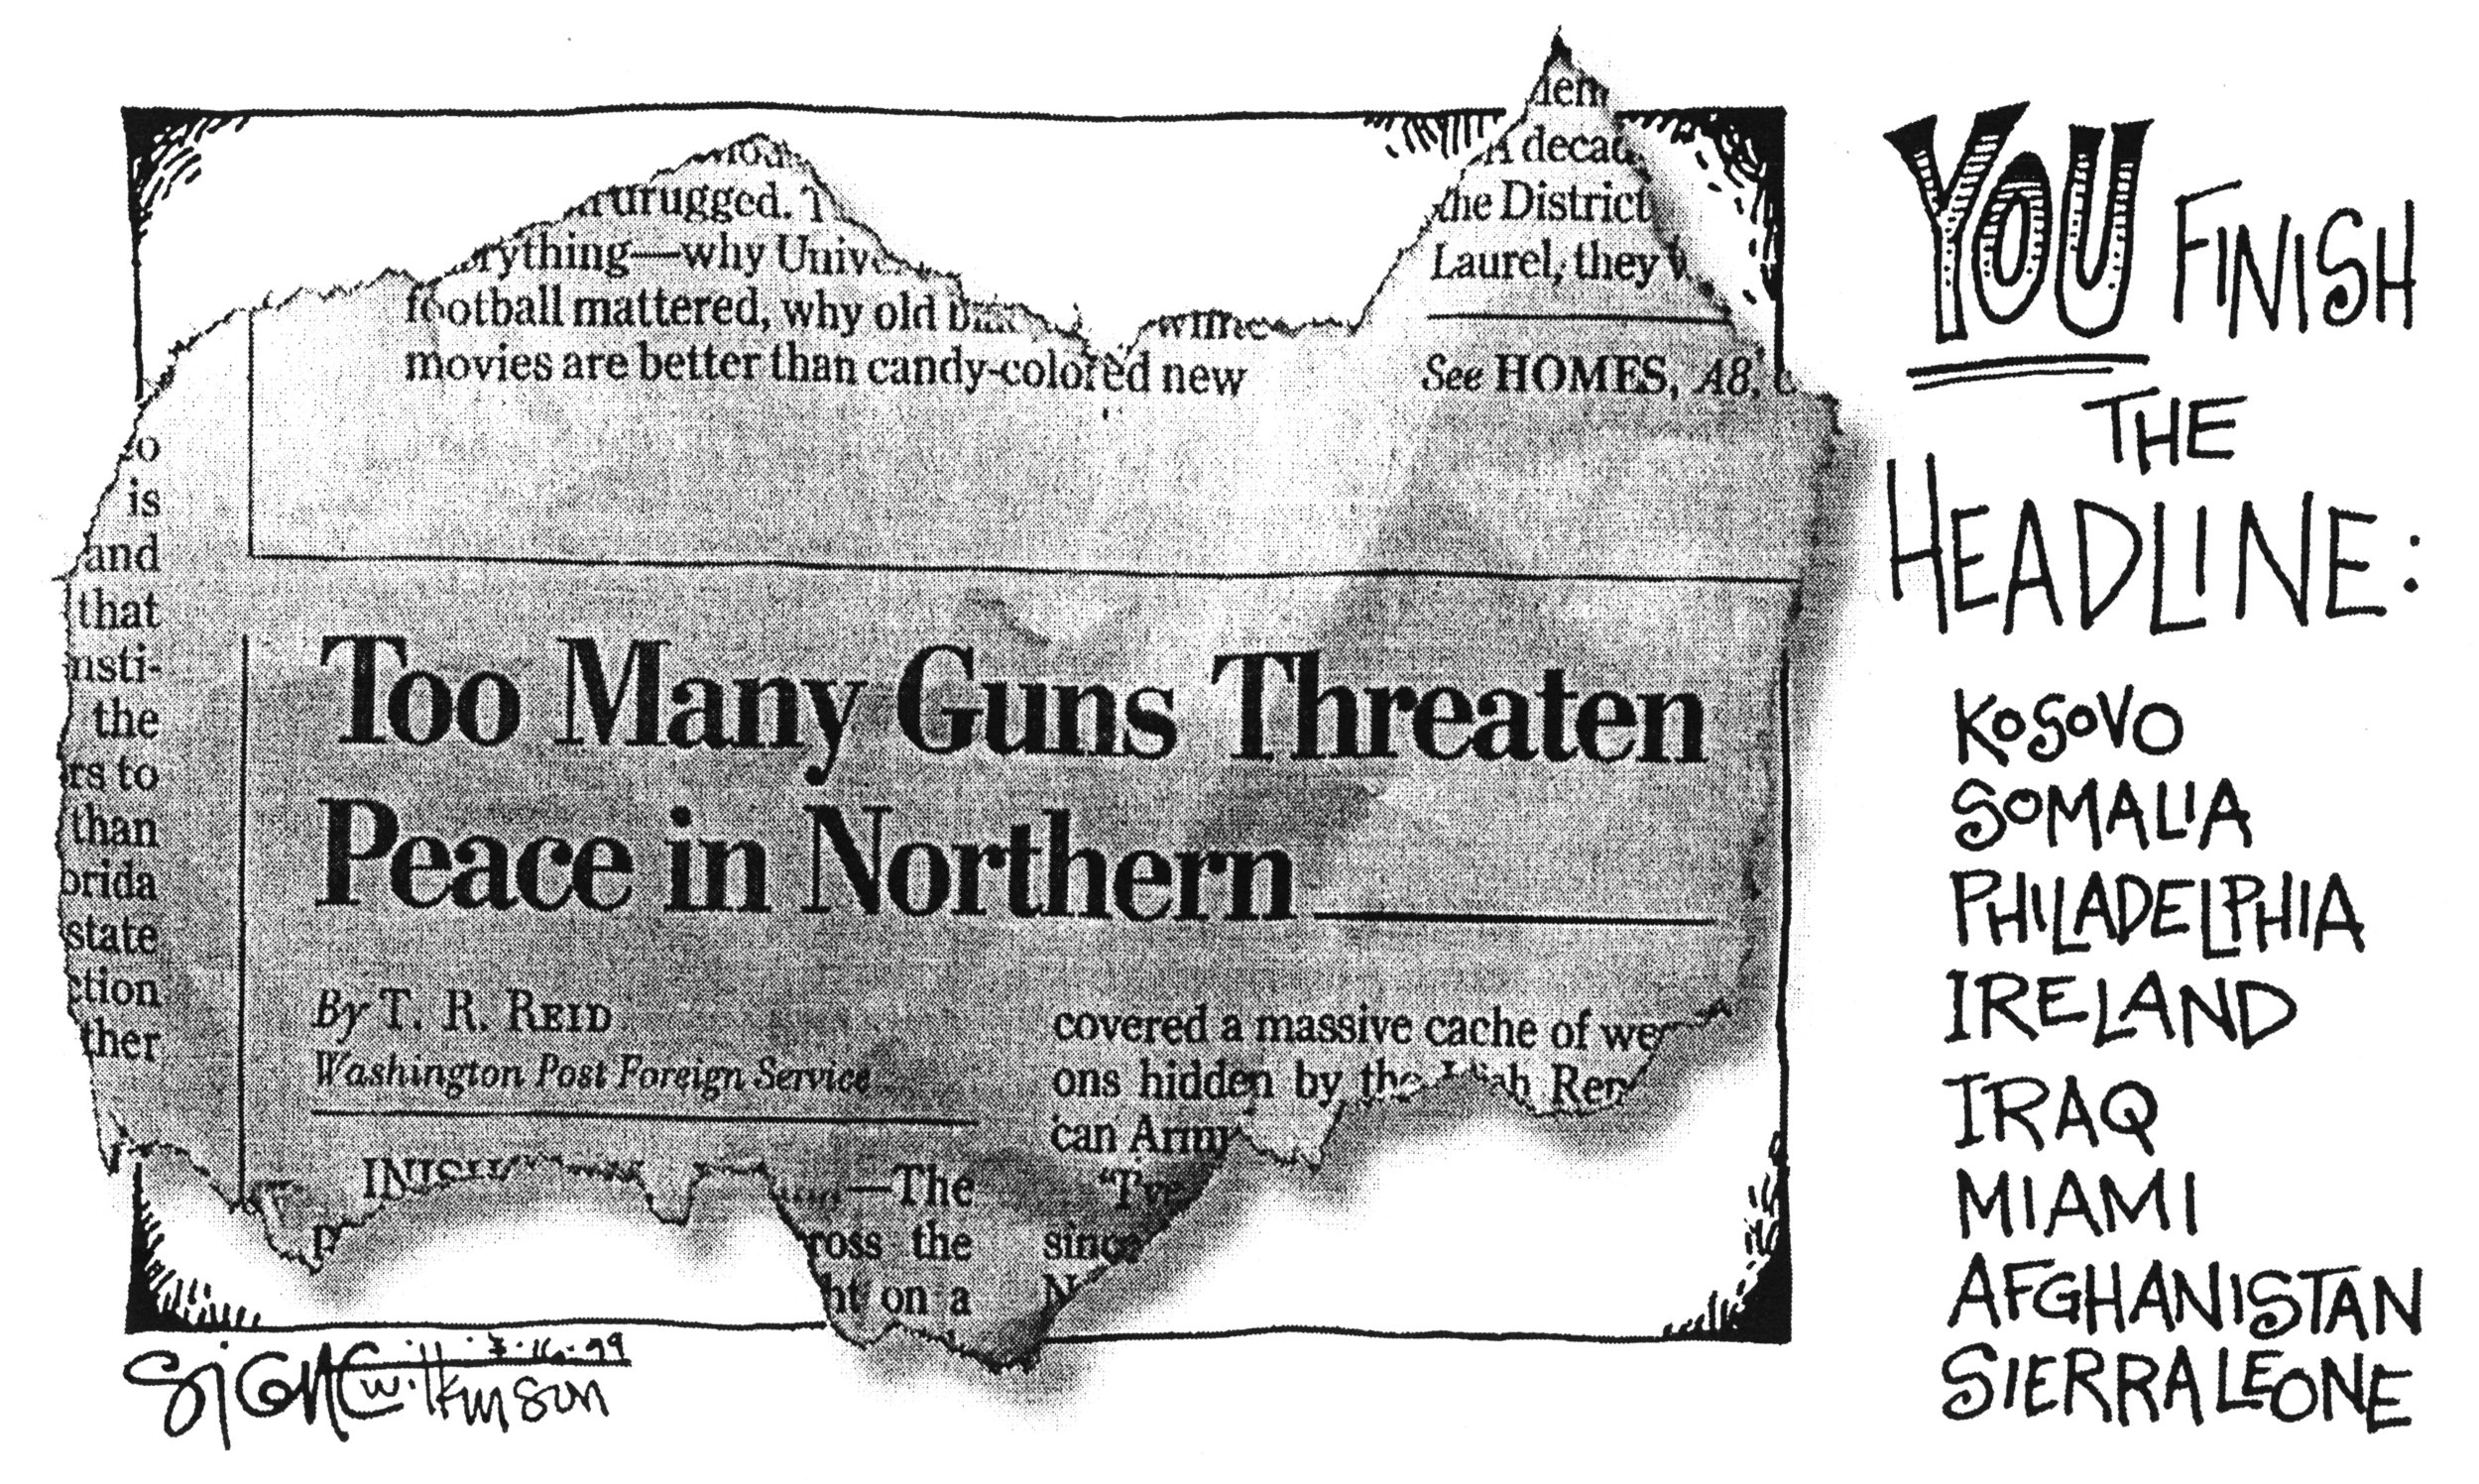 10. 1999-03-16 You Finish The Headline.jpg